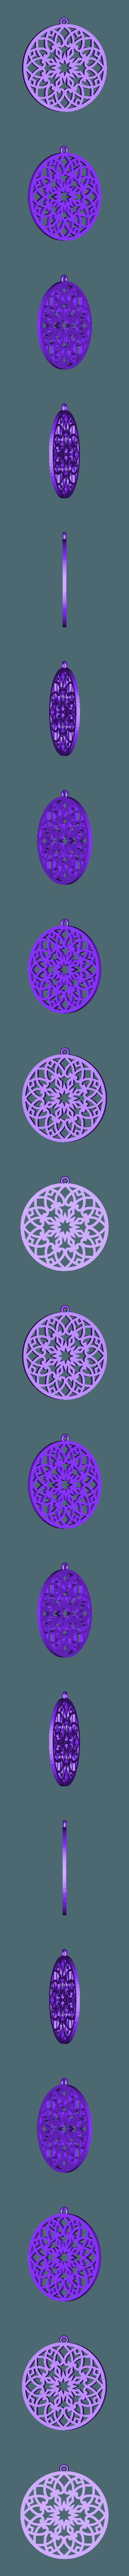 p18.stl Download STL file 2Dpendent • 3D printable design, solunkejagruti